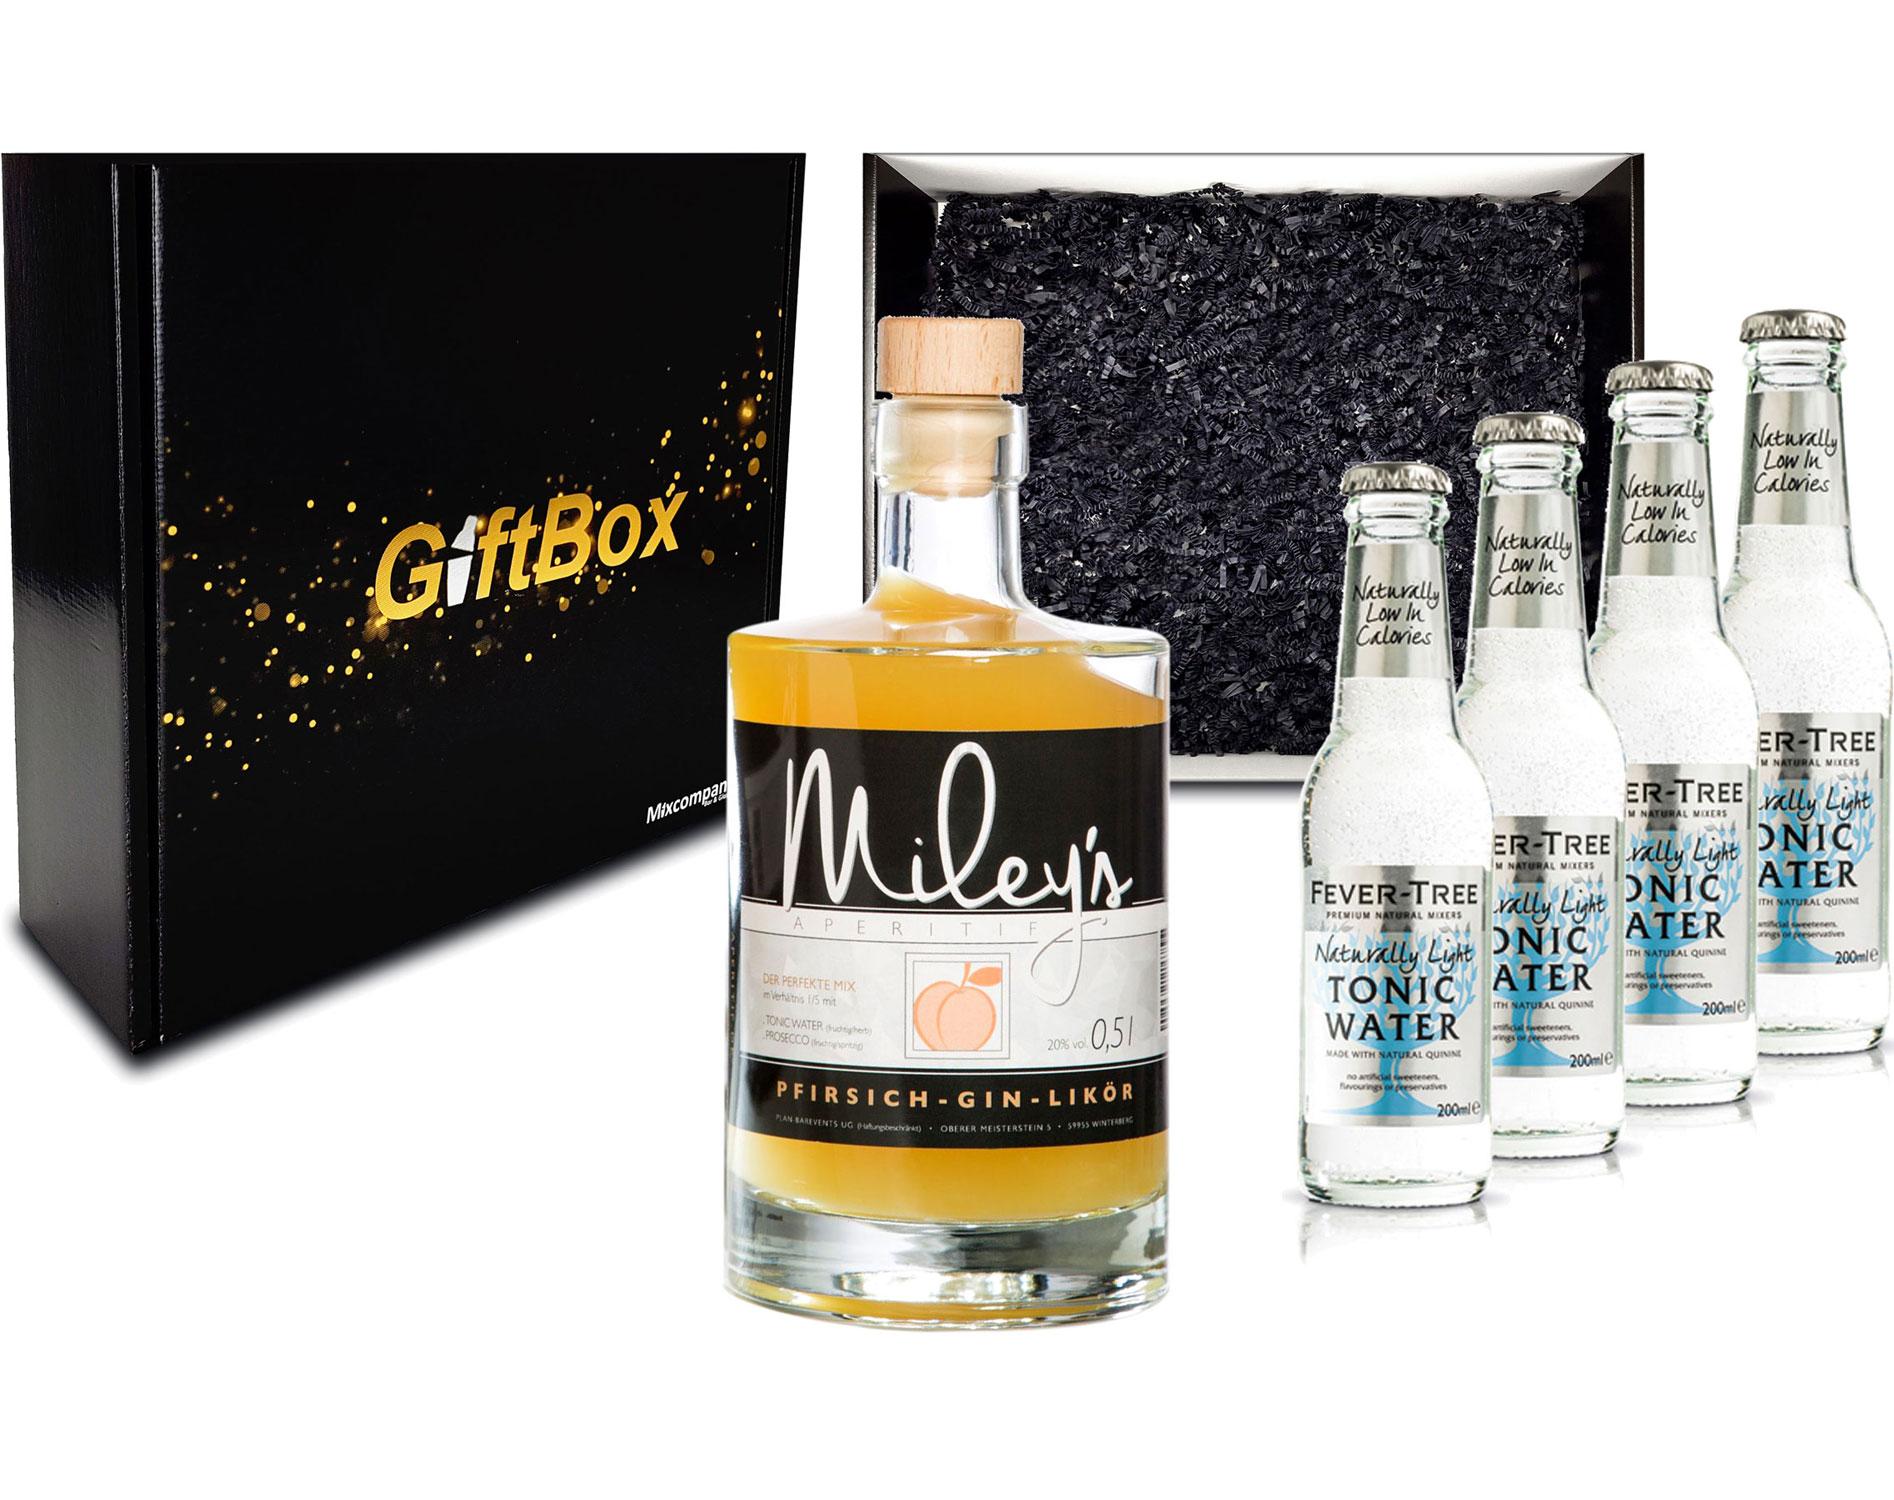 Gin Tonic Giftbox Geschenkset - Mileys Pfirsich Gin Likör 0,5l (20% Vol) + 4x Fever Tree Naturally Light Tonic Water 200ml inkl. Pfand MEHRWEG - [Enthält Sulfite]